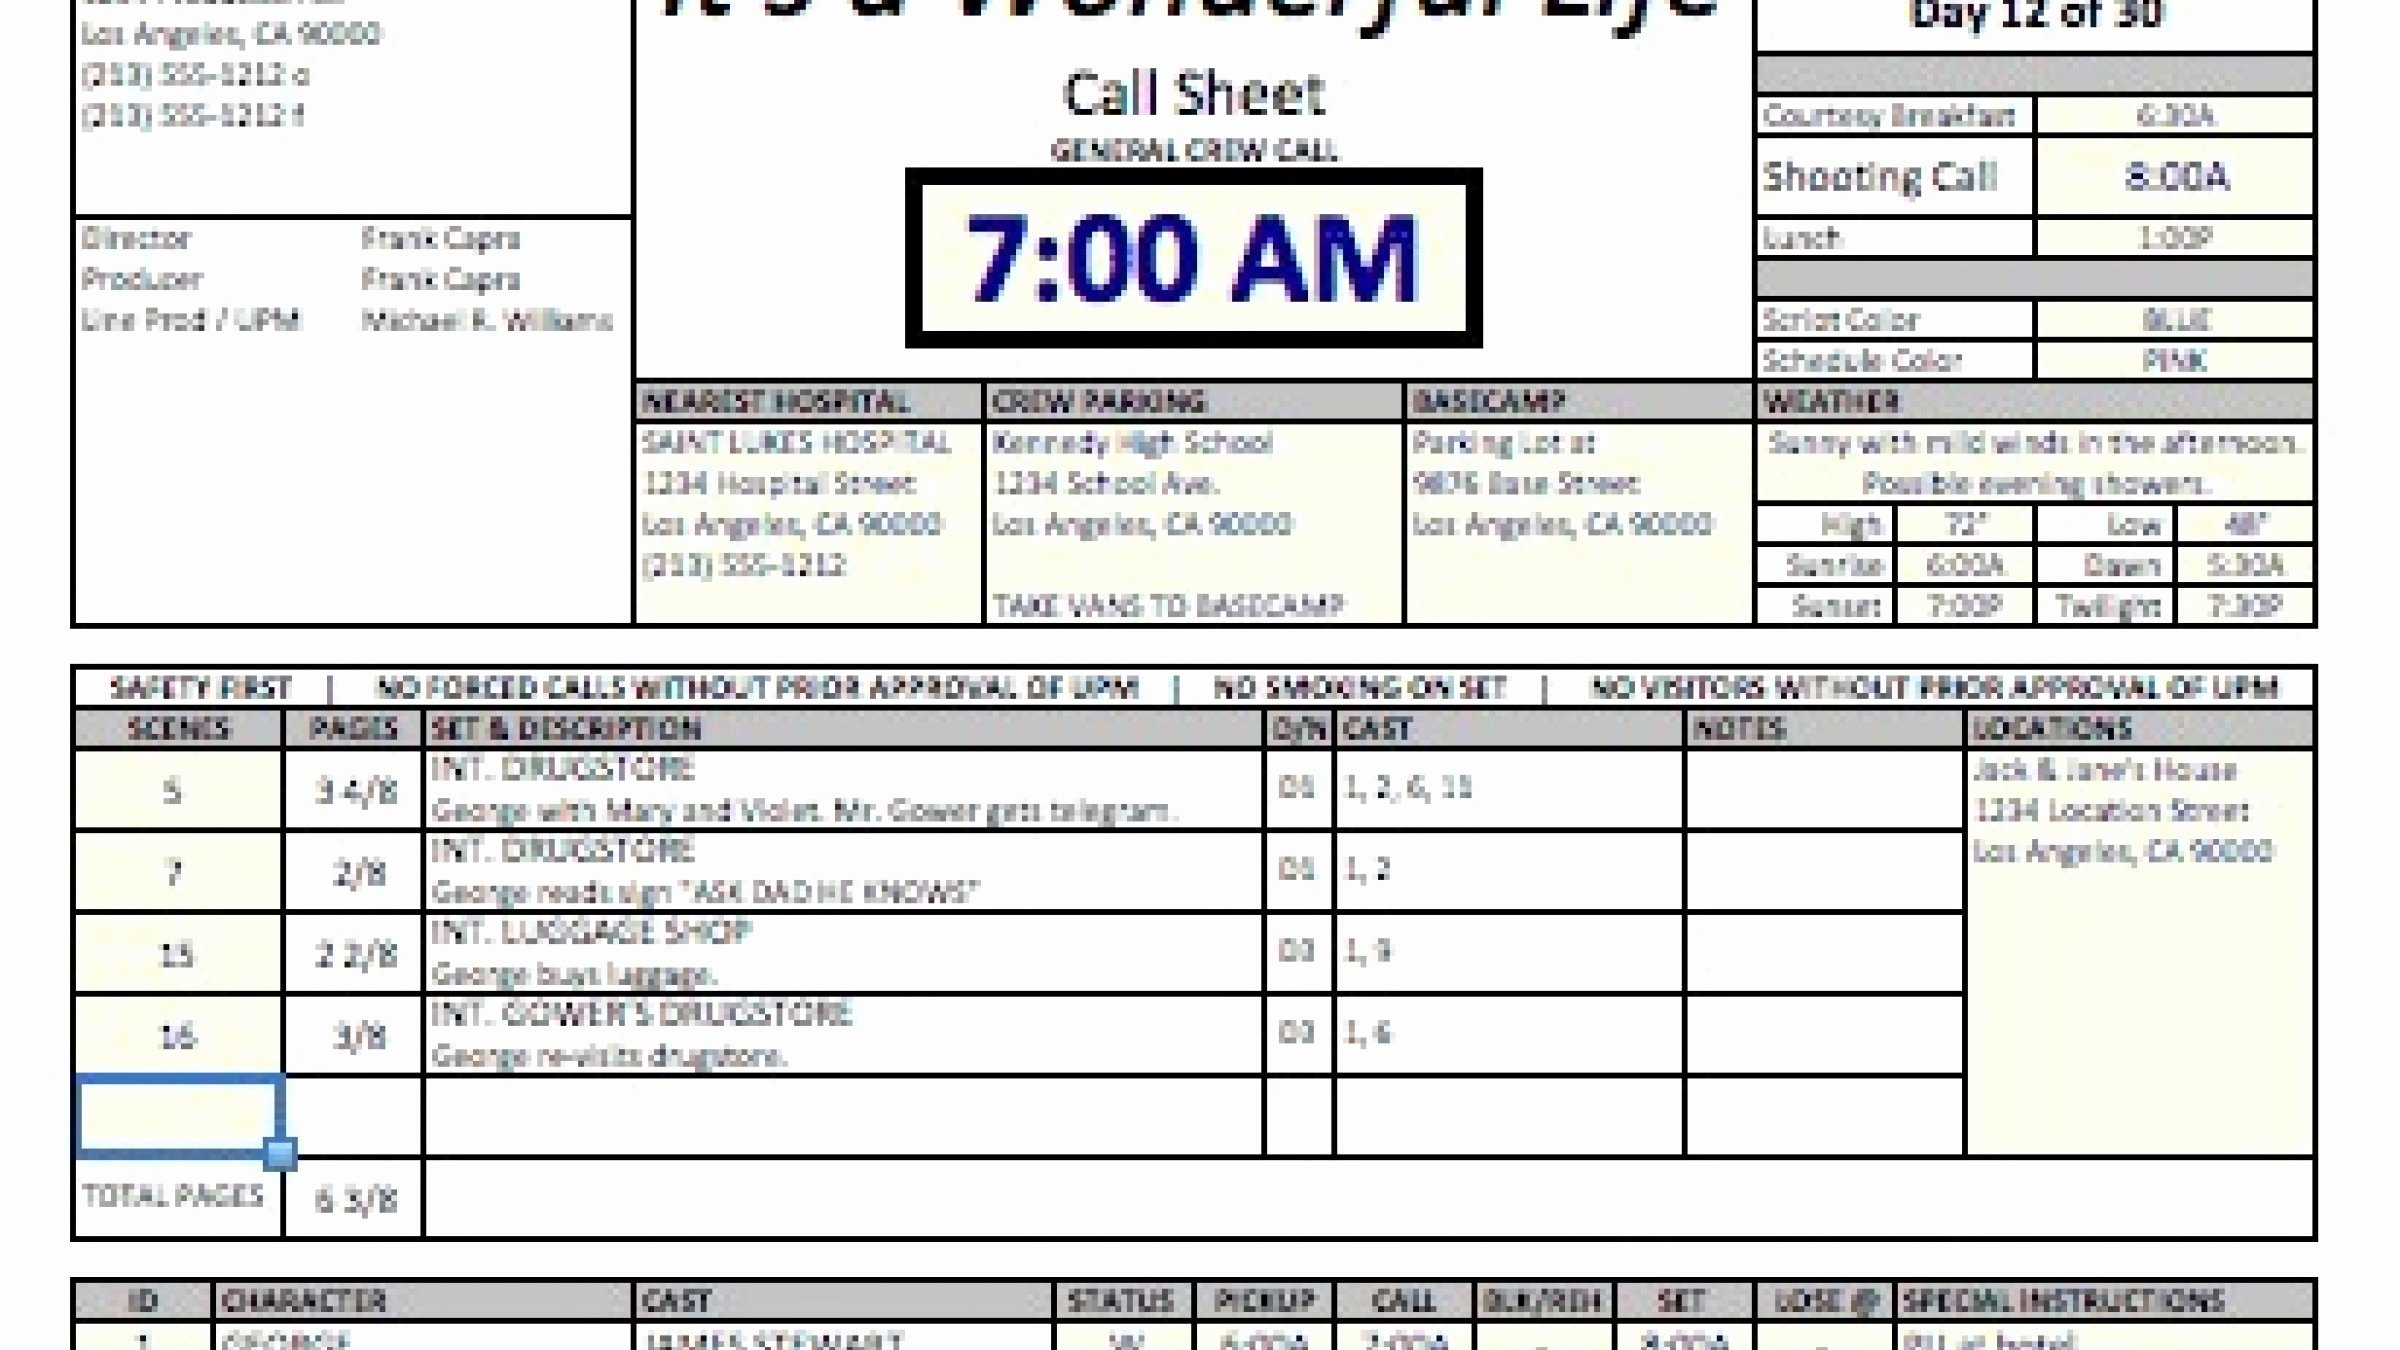 Football Play Sheet Template Lovely Football Play Call Sheet Template Excel Gidiye